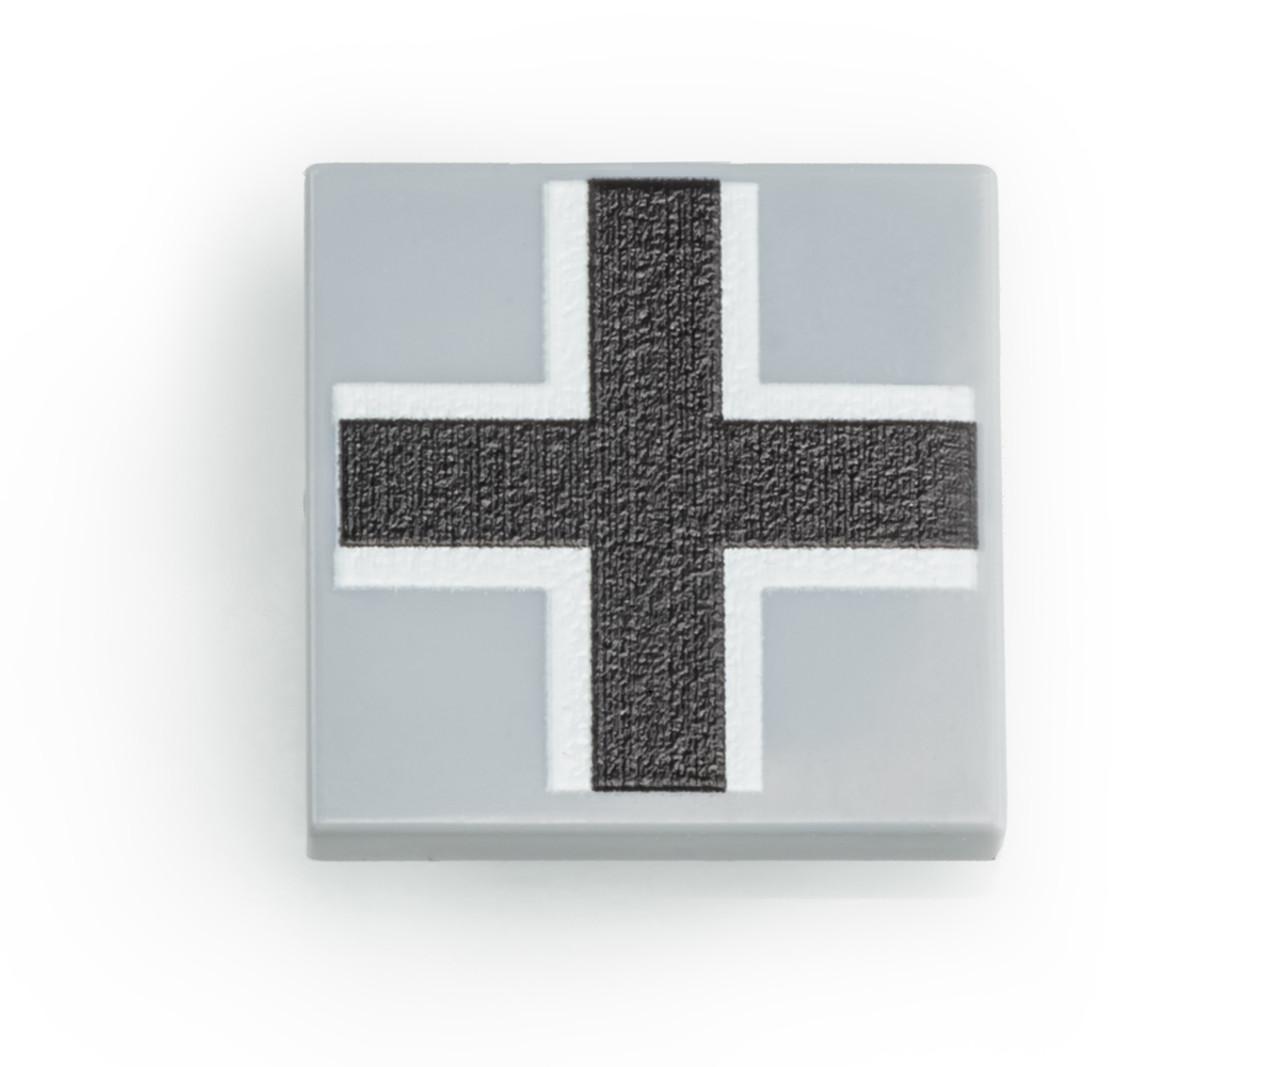 2x2 Balkenkreuz Tile